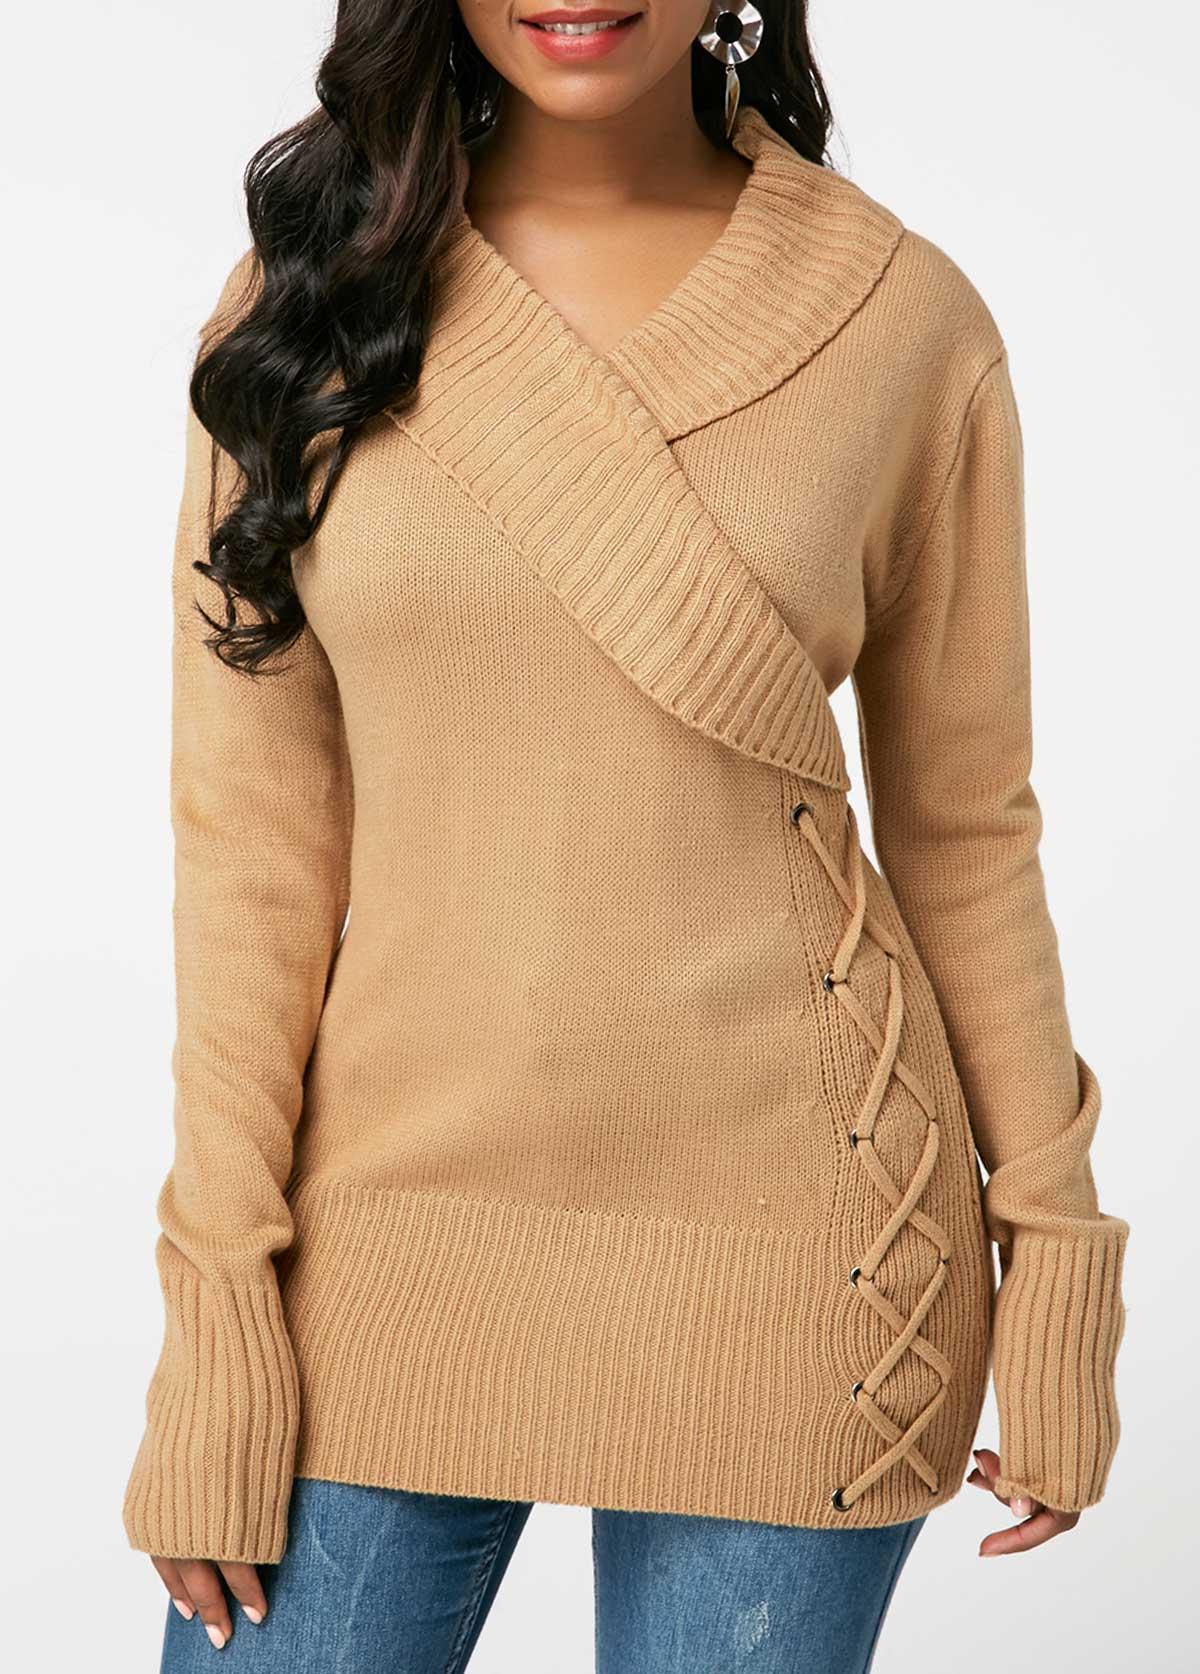 Lace Up Detail Khaki V Neck Sweater